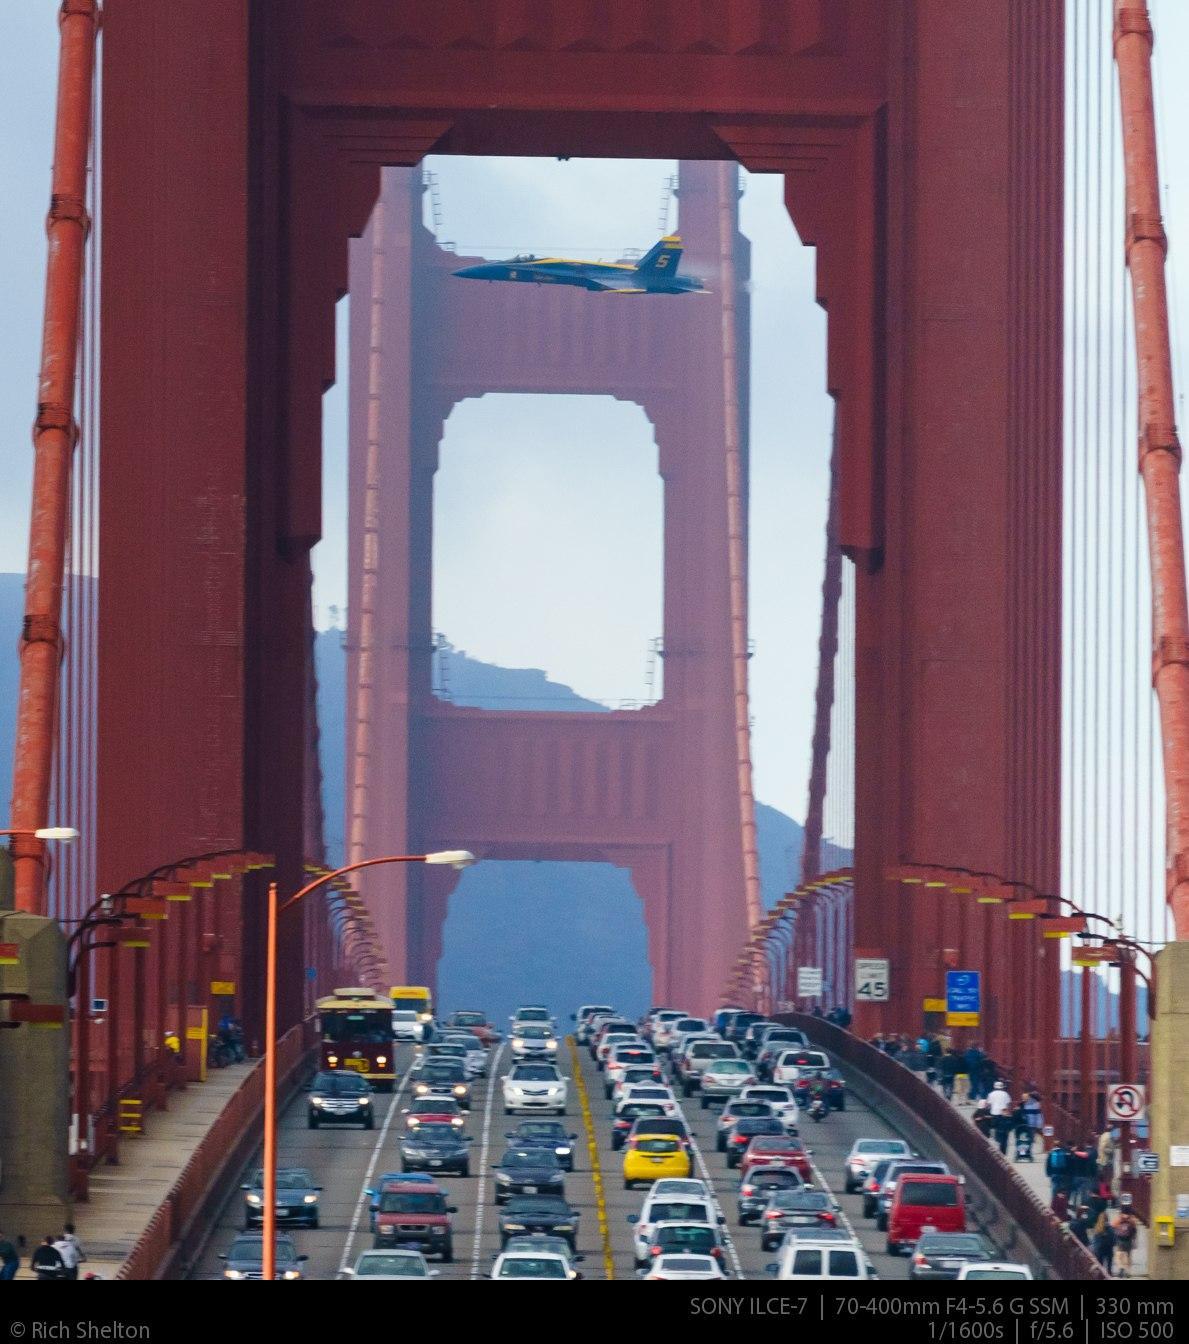 RT @andrewtavani: Man captures unbelievable photo of Blue Angel jet buzzing the Golden Gate Bridge at 350 mph: http://t.co/0gb441AqA3 http:…